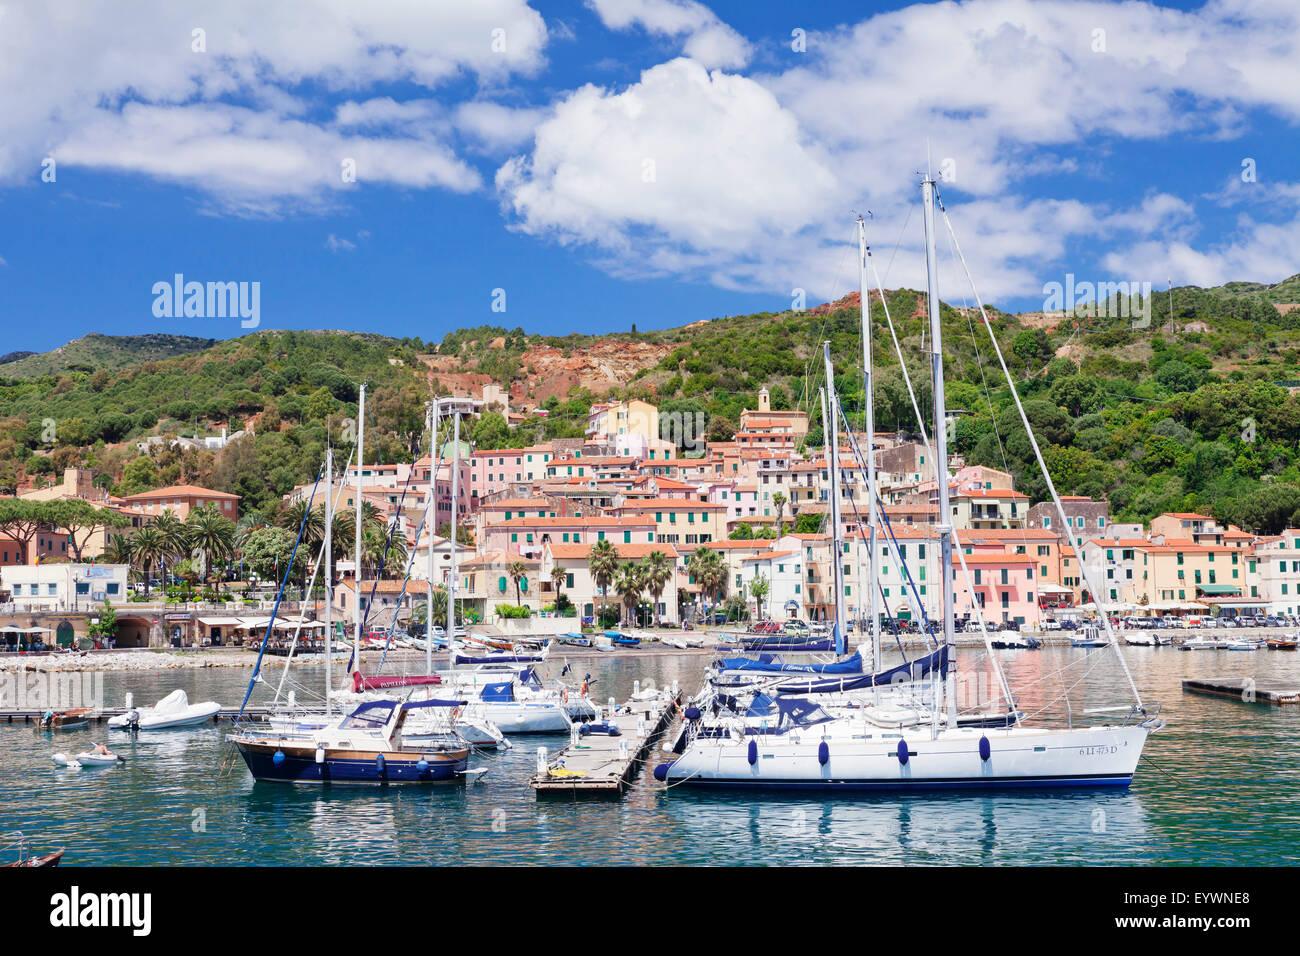 Harbour, Rio Marina, Island of Elba, Livorno Province, Tuscany, Italy, Mediterranean, Europe - Stock Image